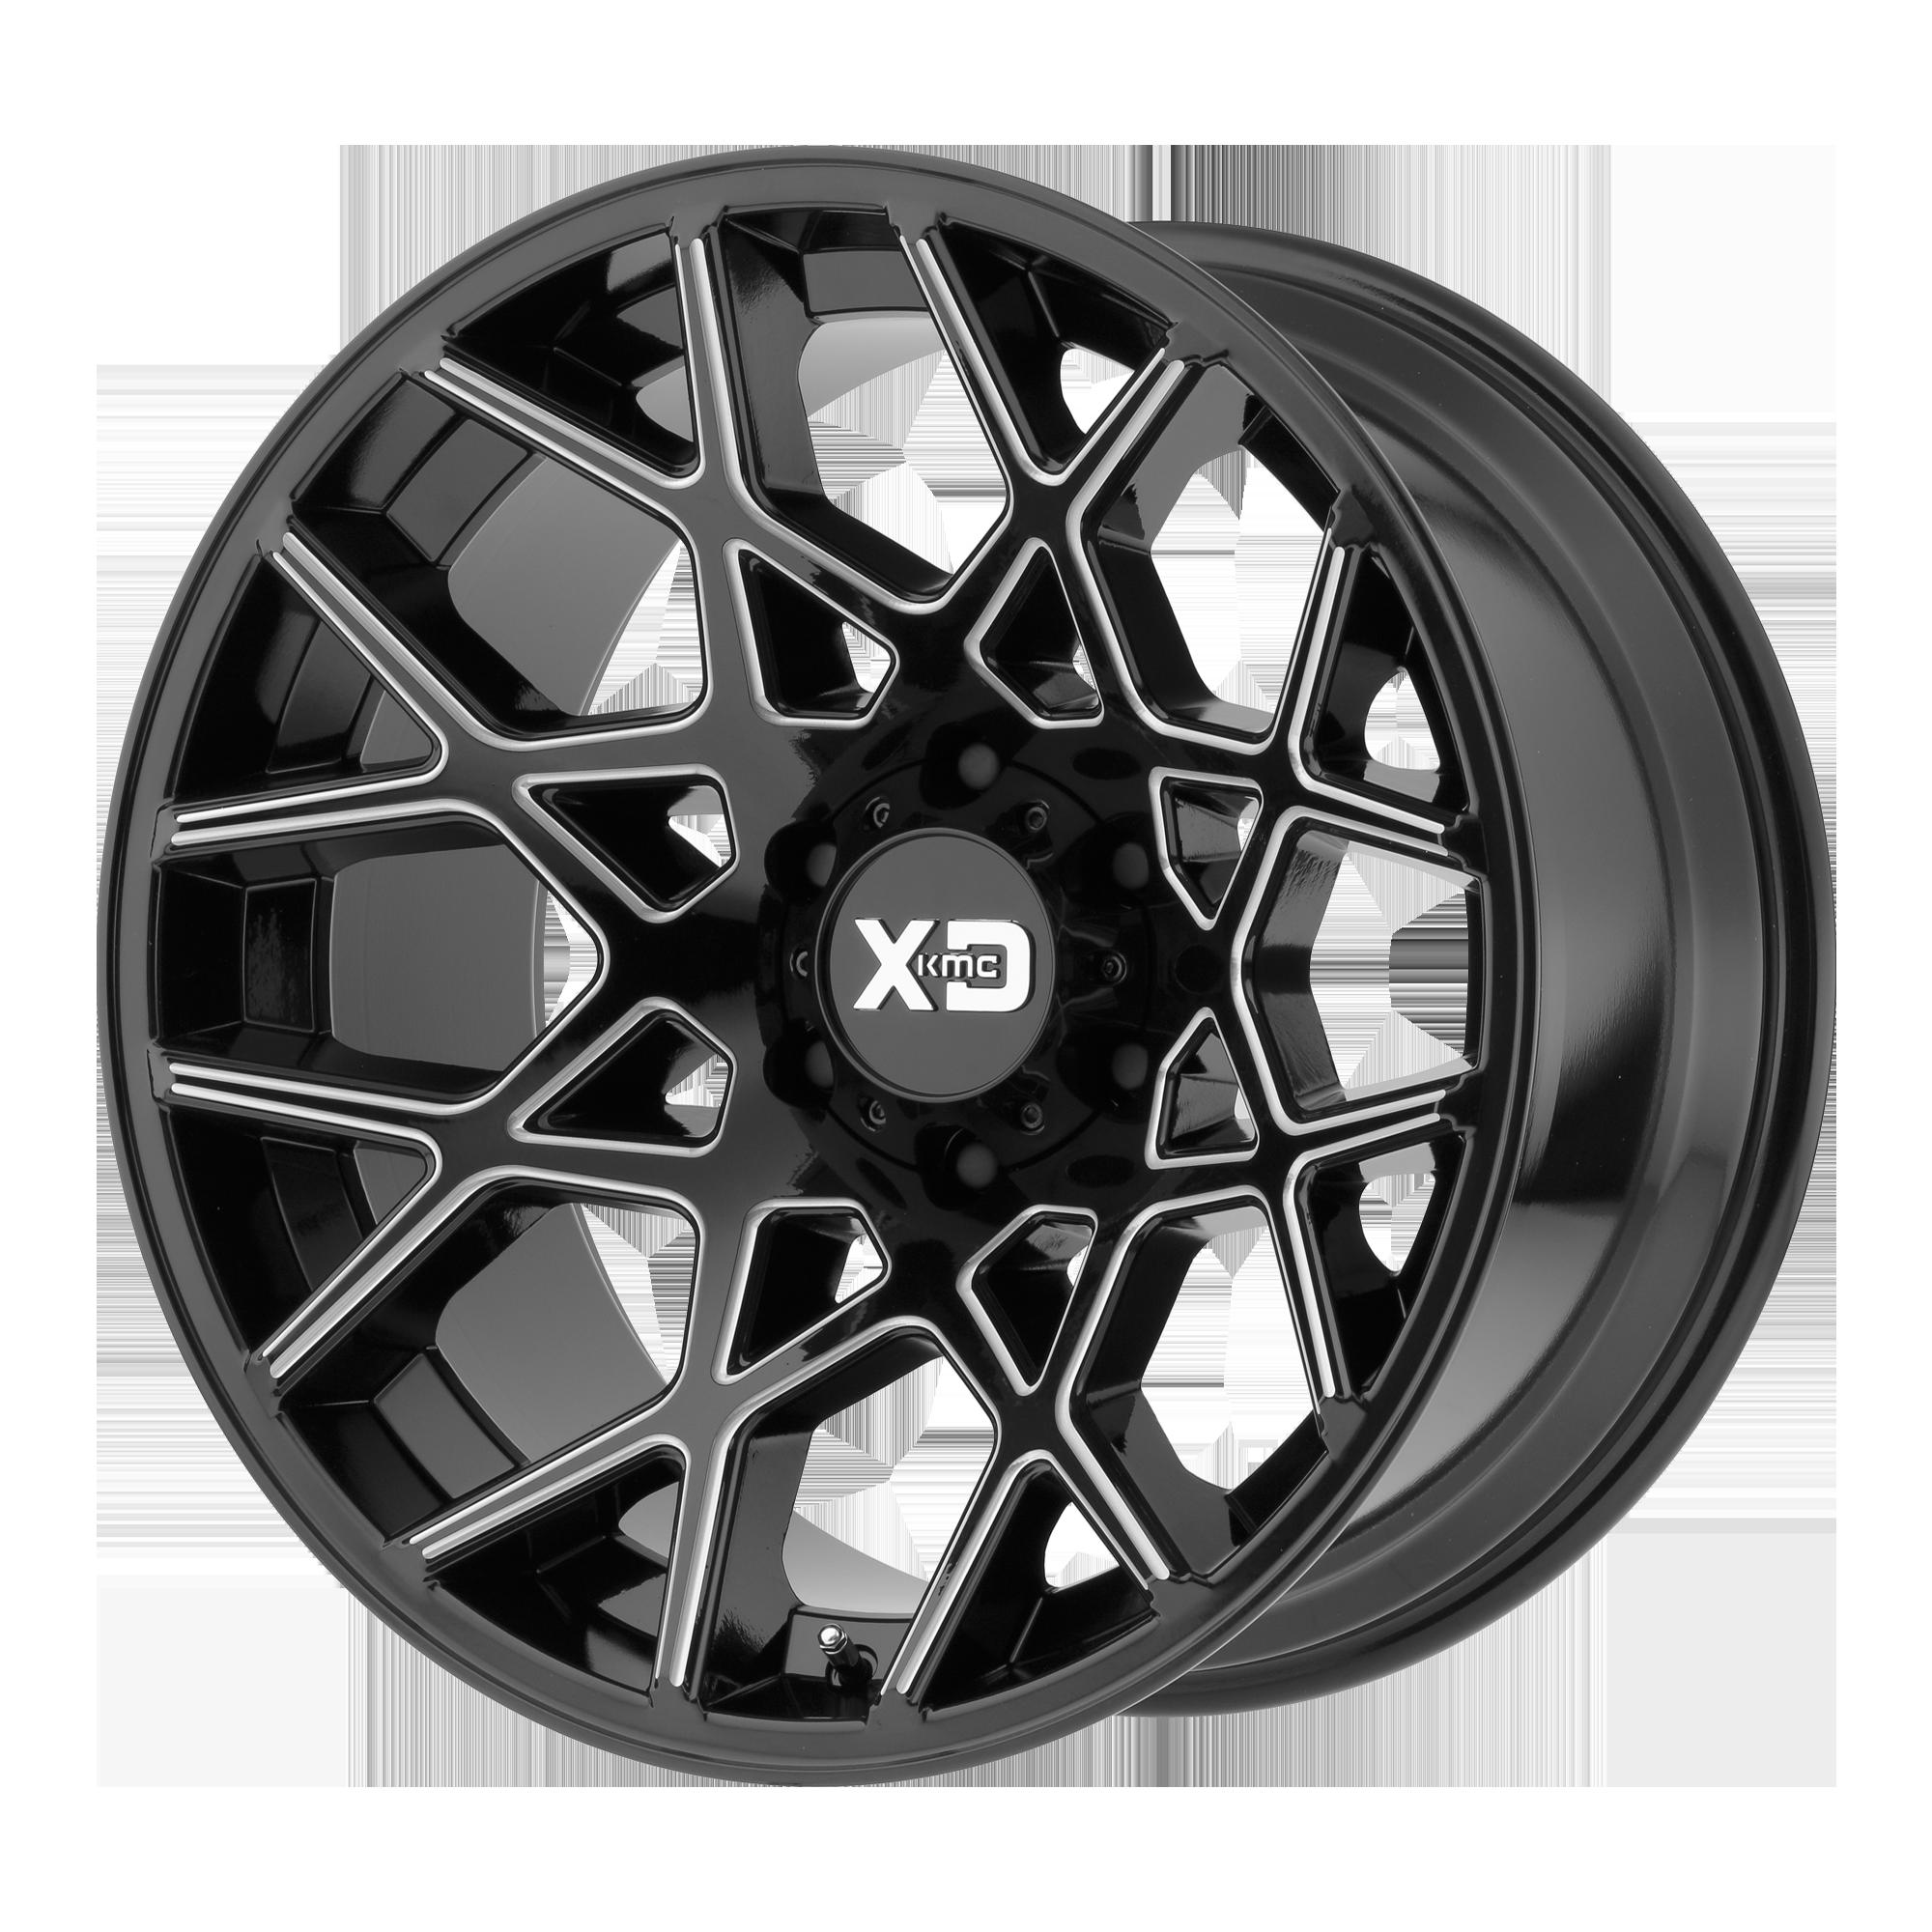 XD SERIES XD831 CHOPSTIX hliníkové disky 10x20 5x127 ET-24 Gloss Black Milled